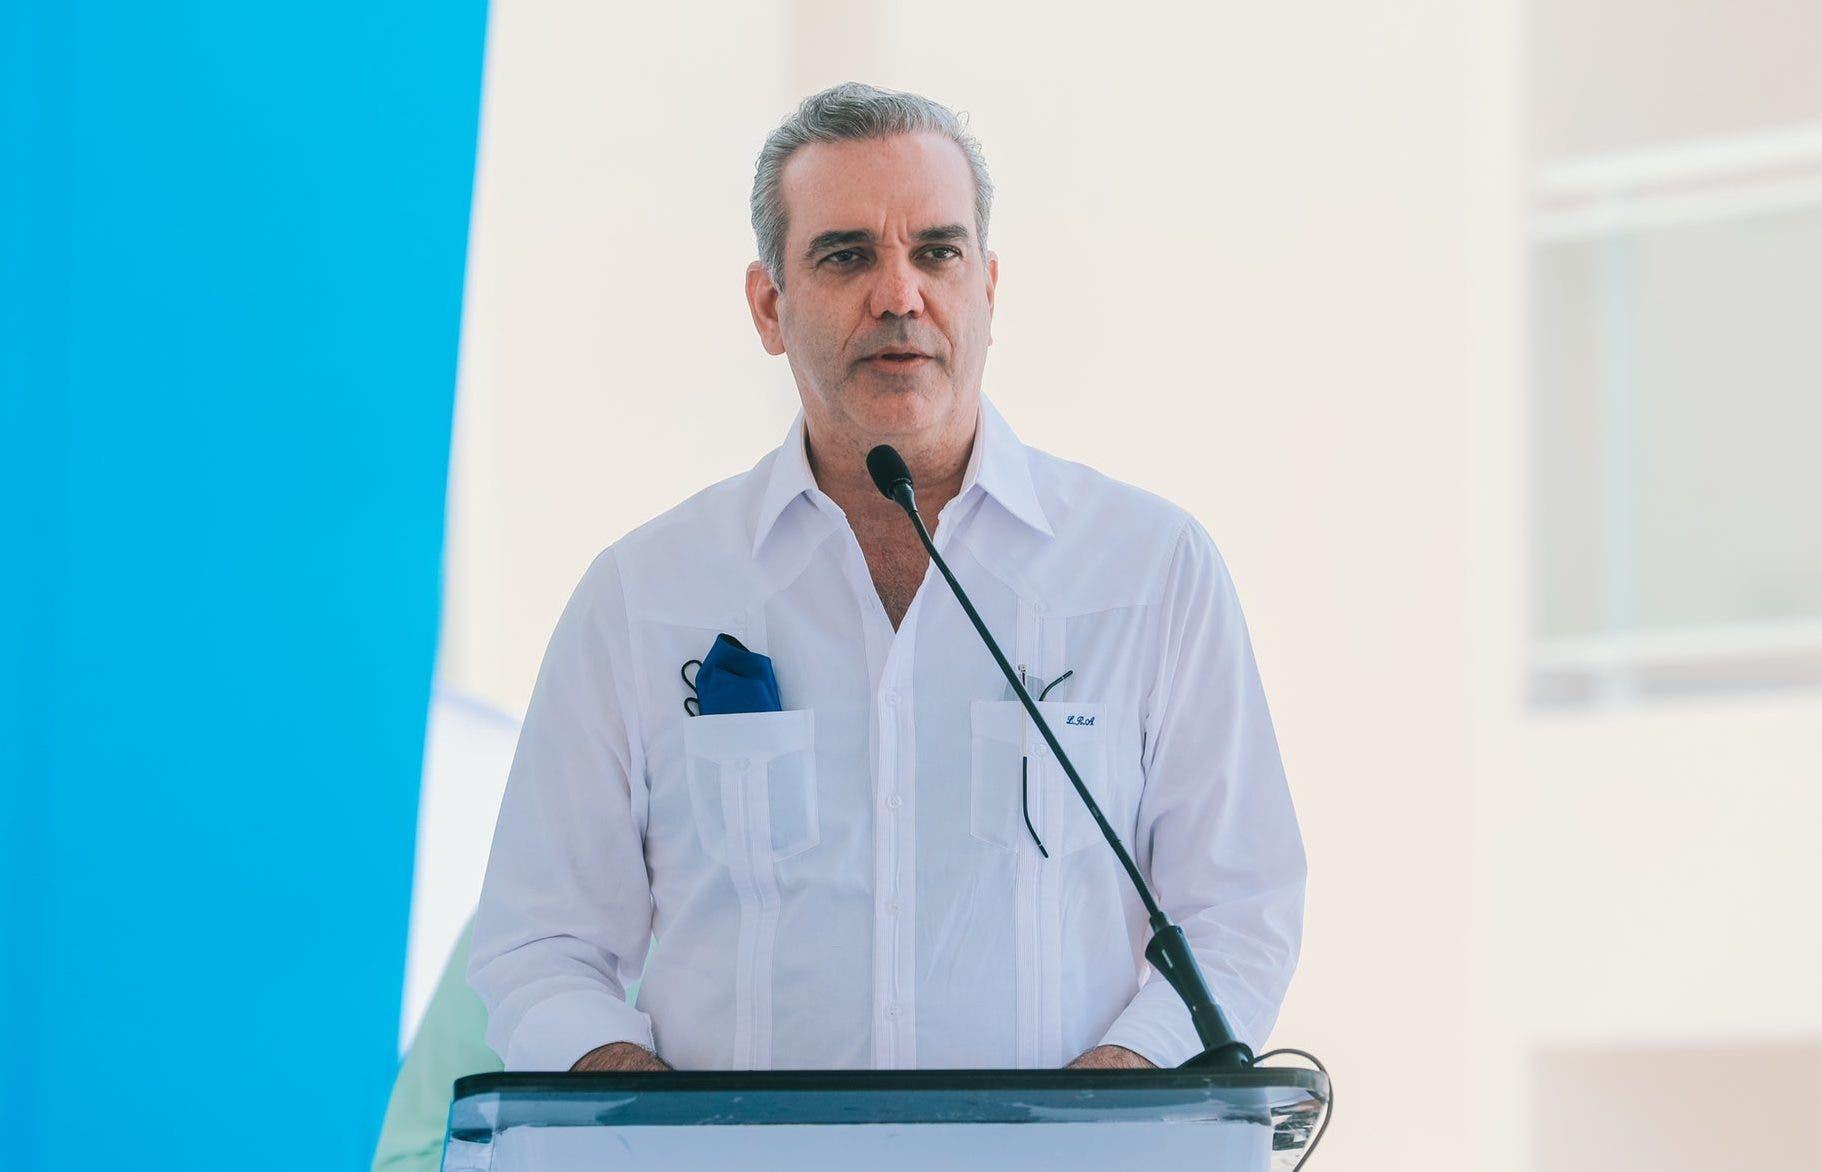 Presidente Abinader viaja hoy a Santiago; inaugurará dos obras